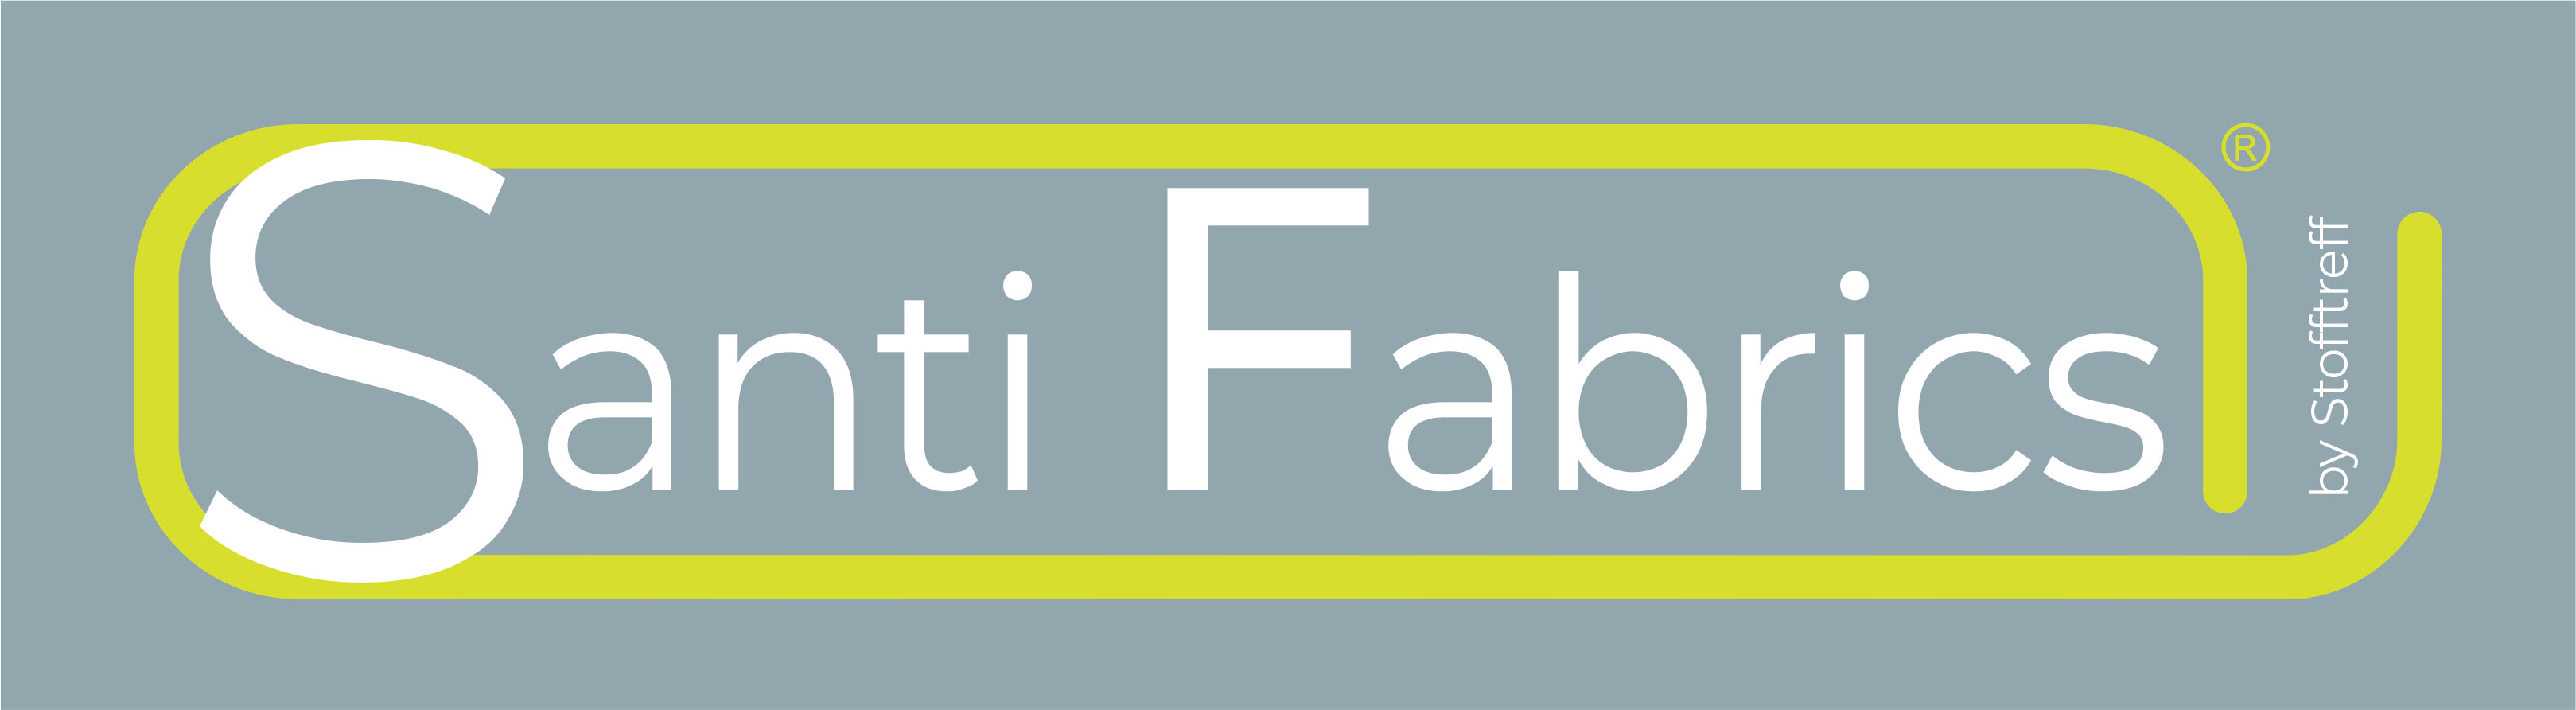 Santi-Fabrics-ocker-76260